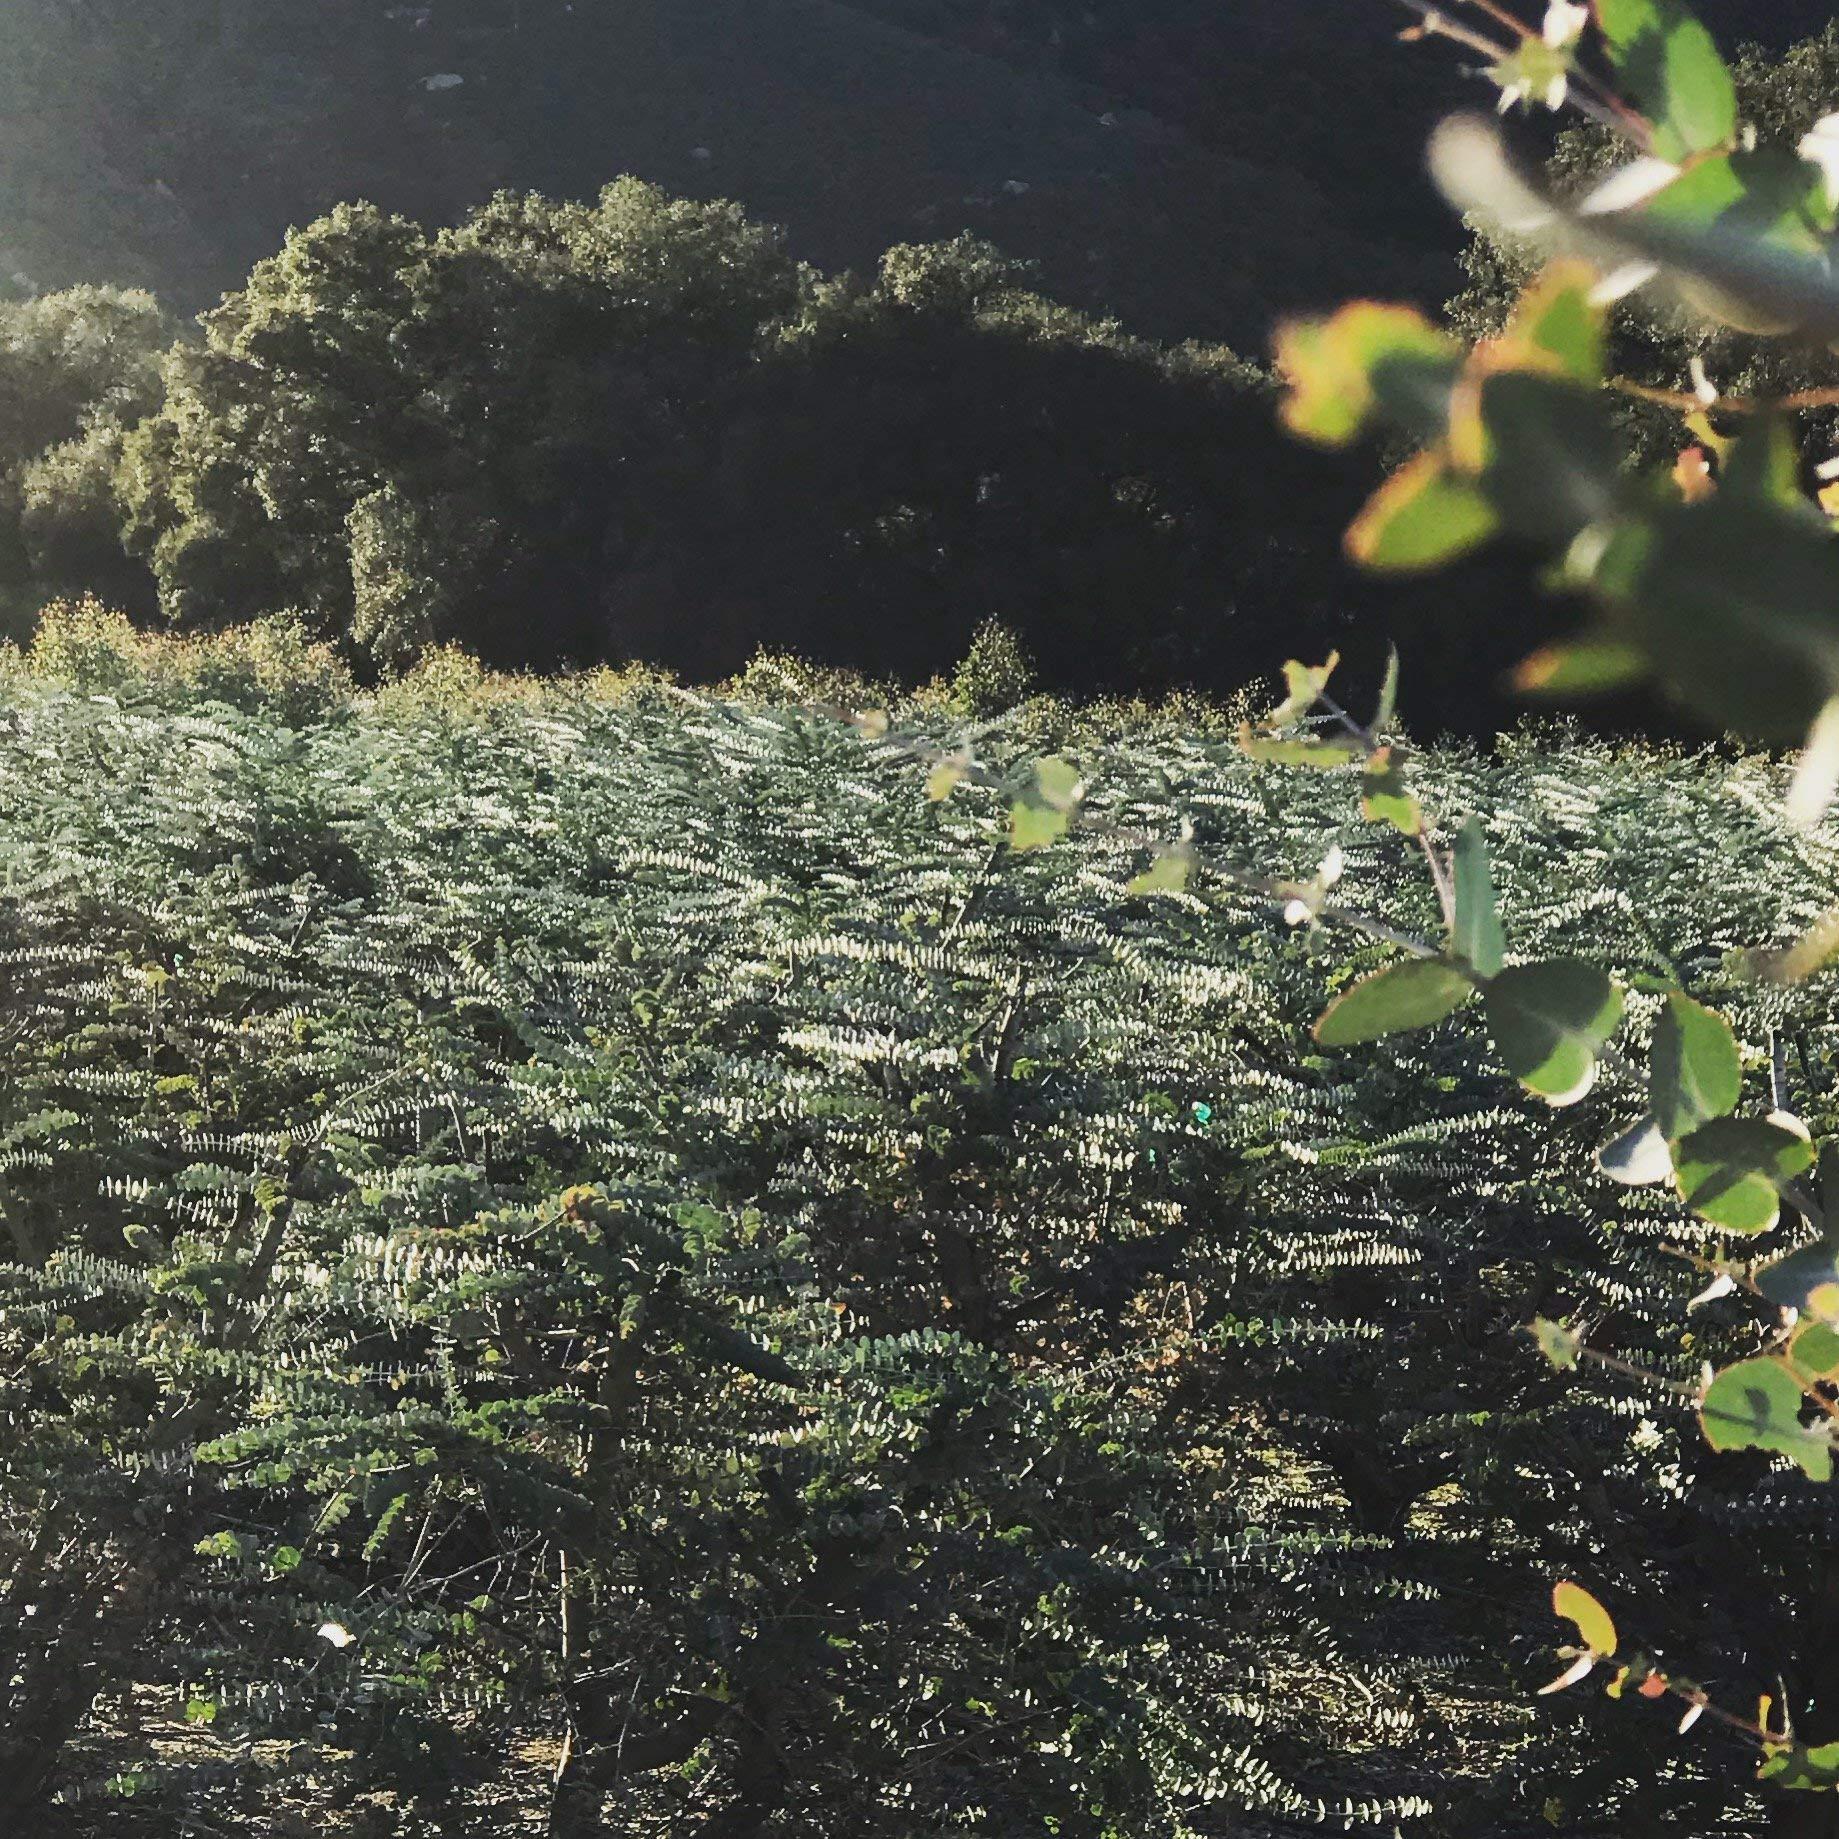 Fresh Eucalyptus (Regular Bunch), Fresh Eucalyptus Shower, Aromatherapy, Asthma, Baby Blue Eucalyptus, Silver Dollar Eucalyptus, Spiral, Shower Bath Plant, Weddings by MovaGarden (Image #2)